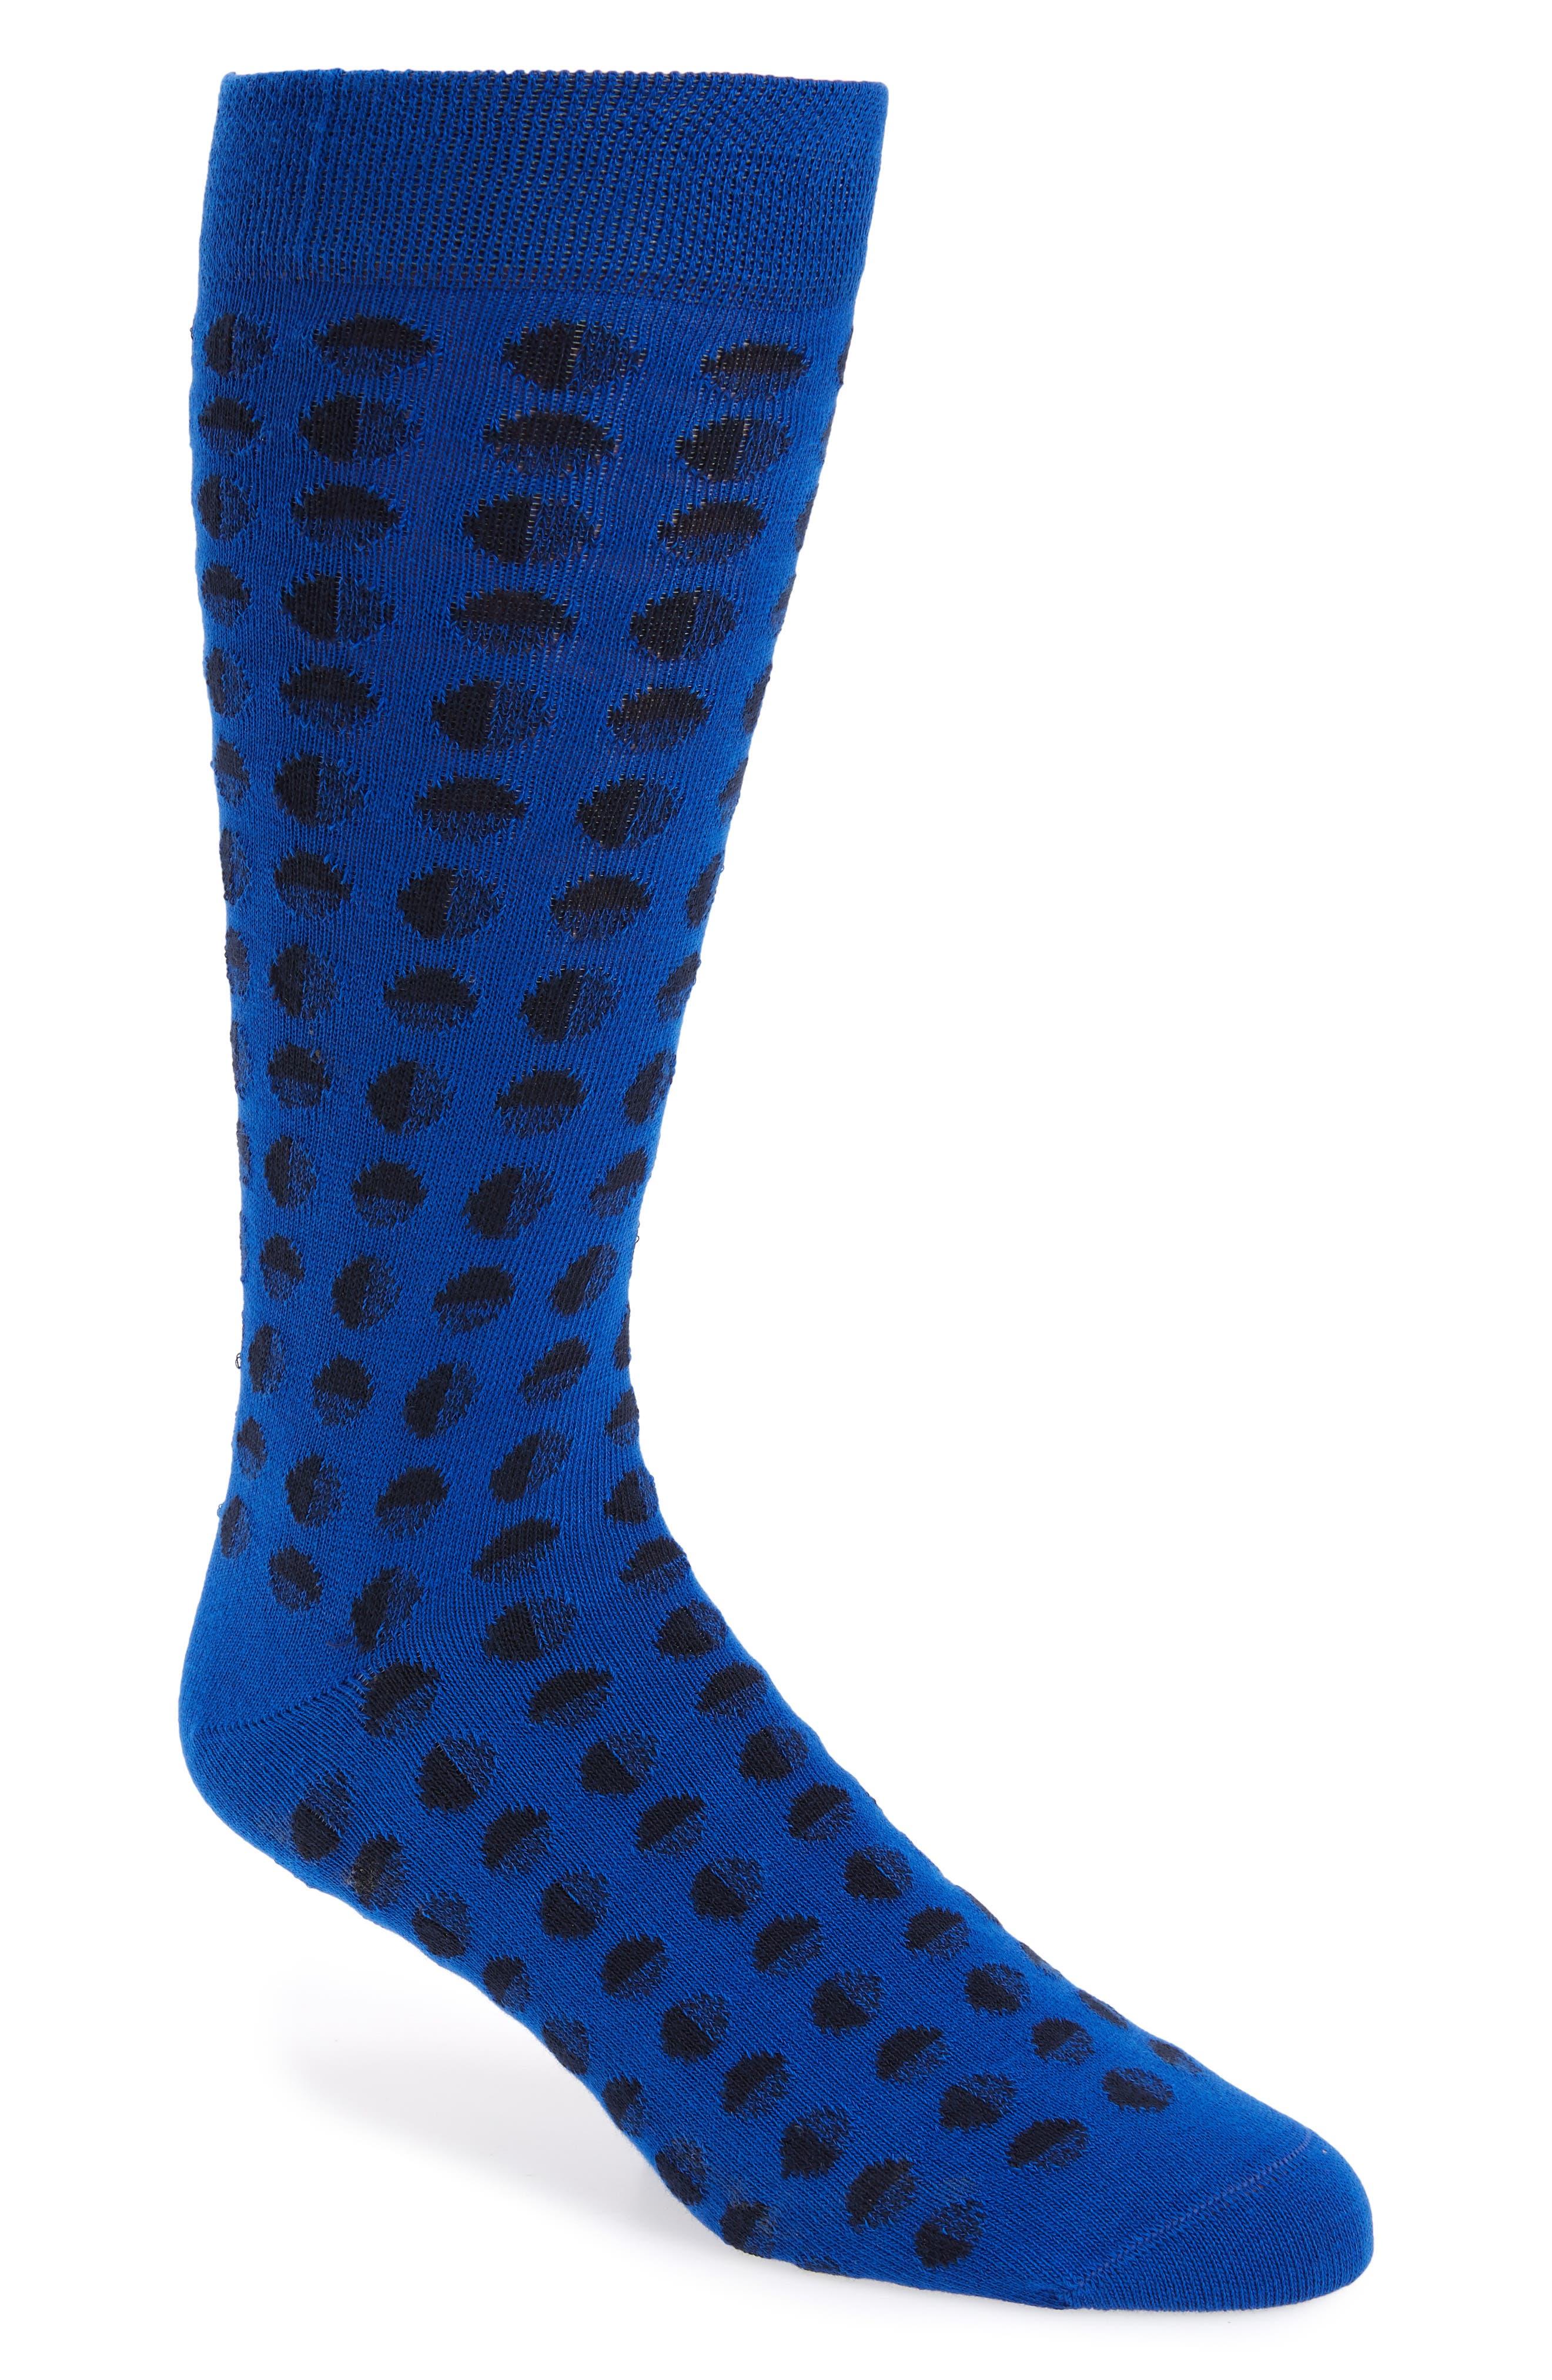 Mitchum Dot Socks,                         Main,                         color, 421